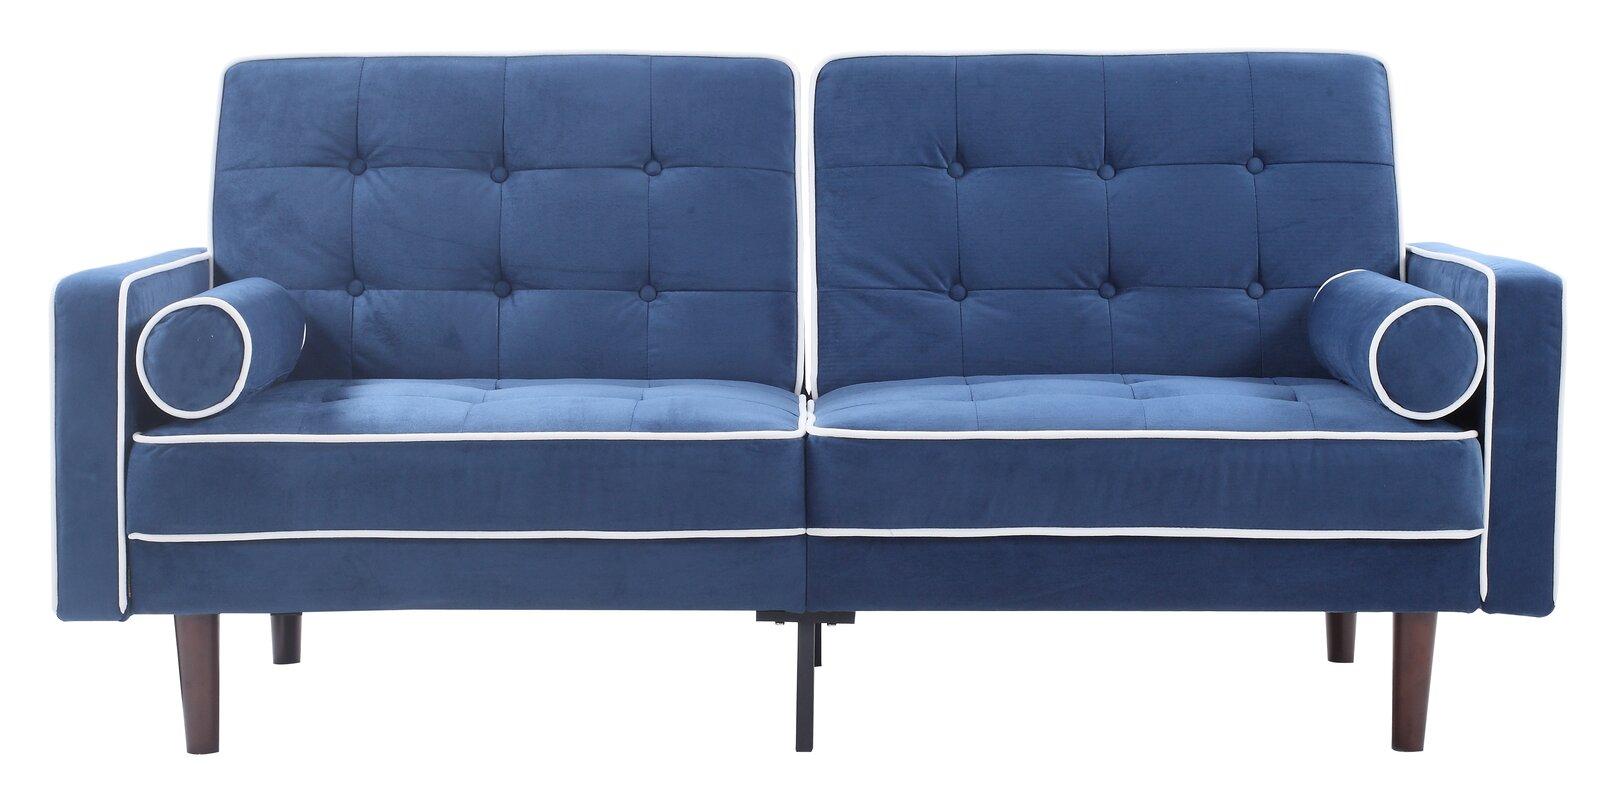 madison home usa mid century modern convertible sofa  reviews  - defaultname